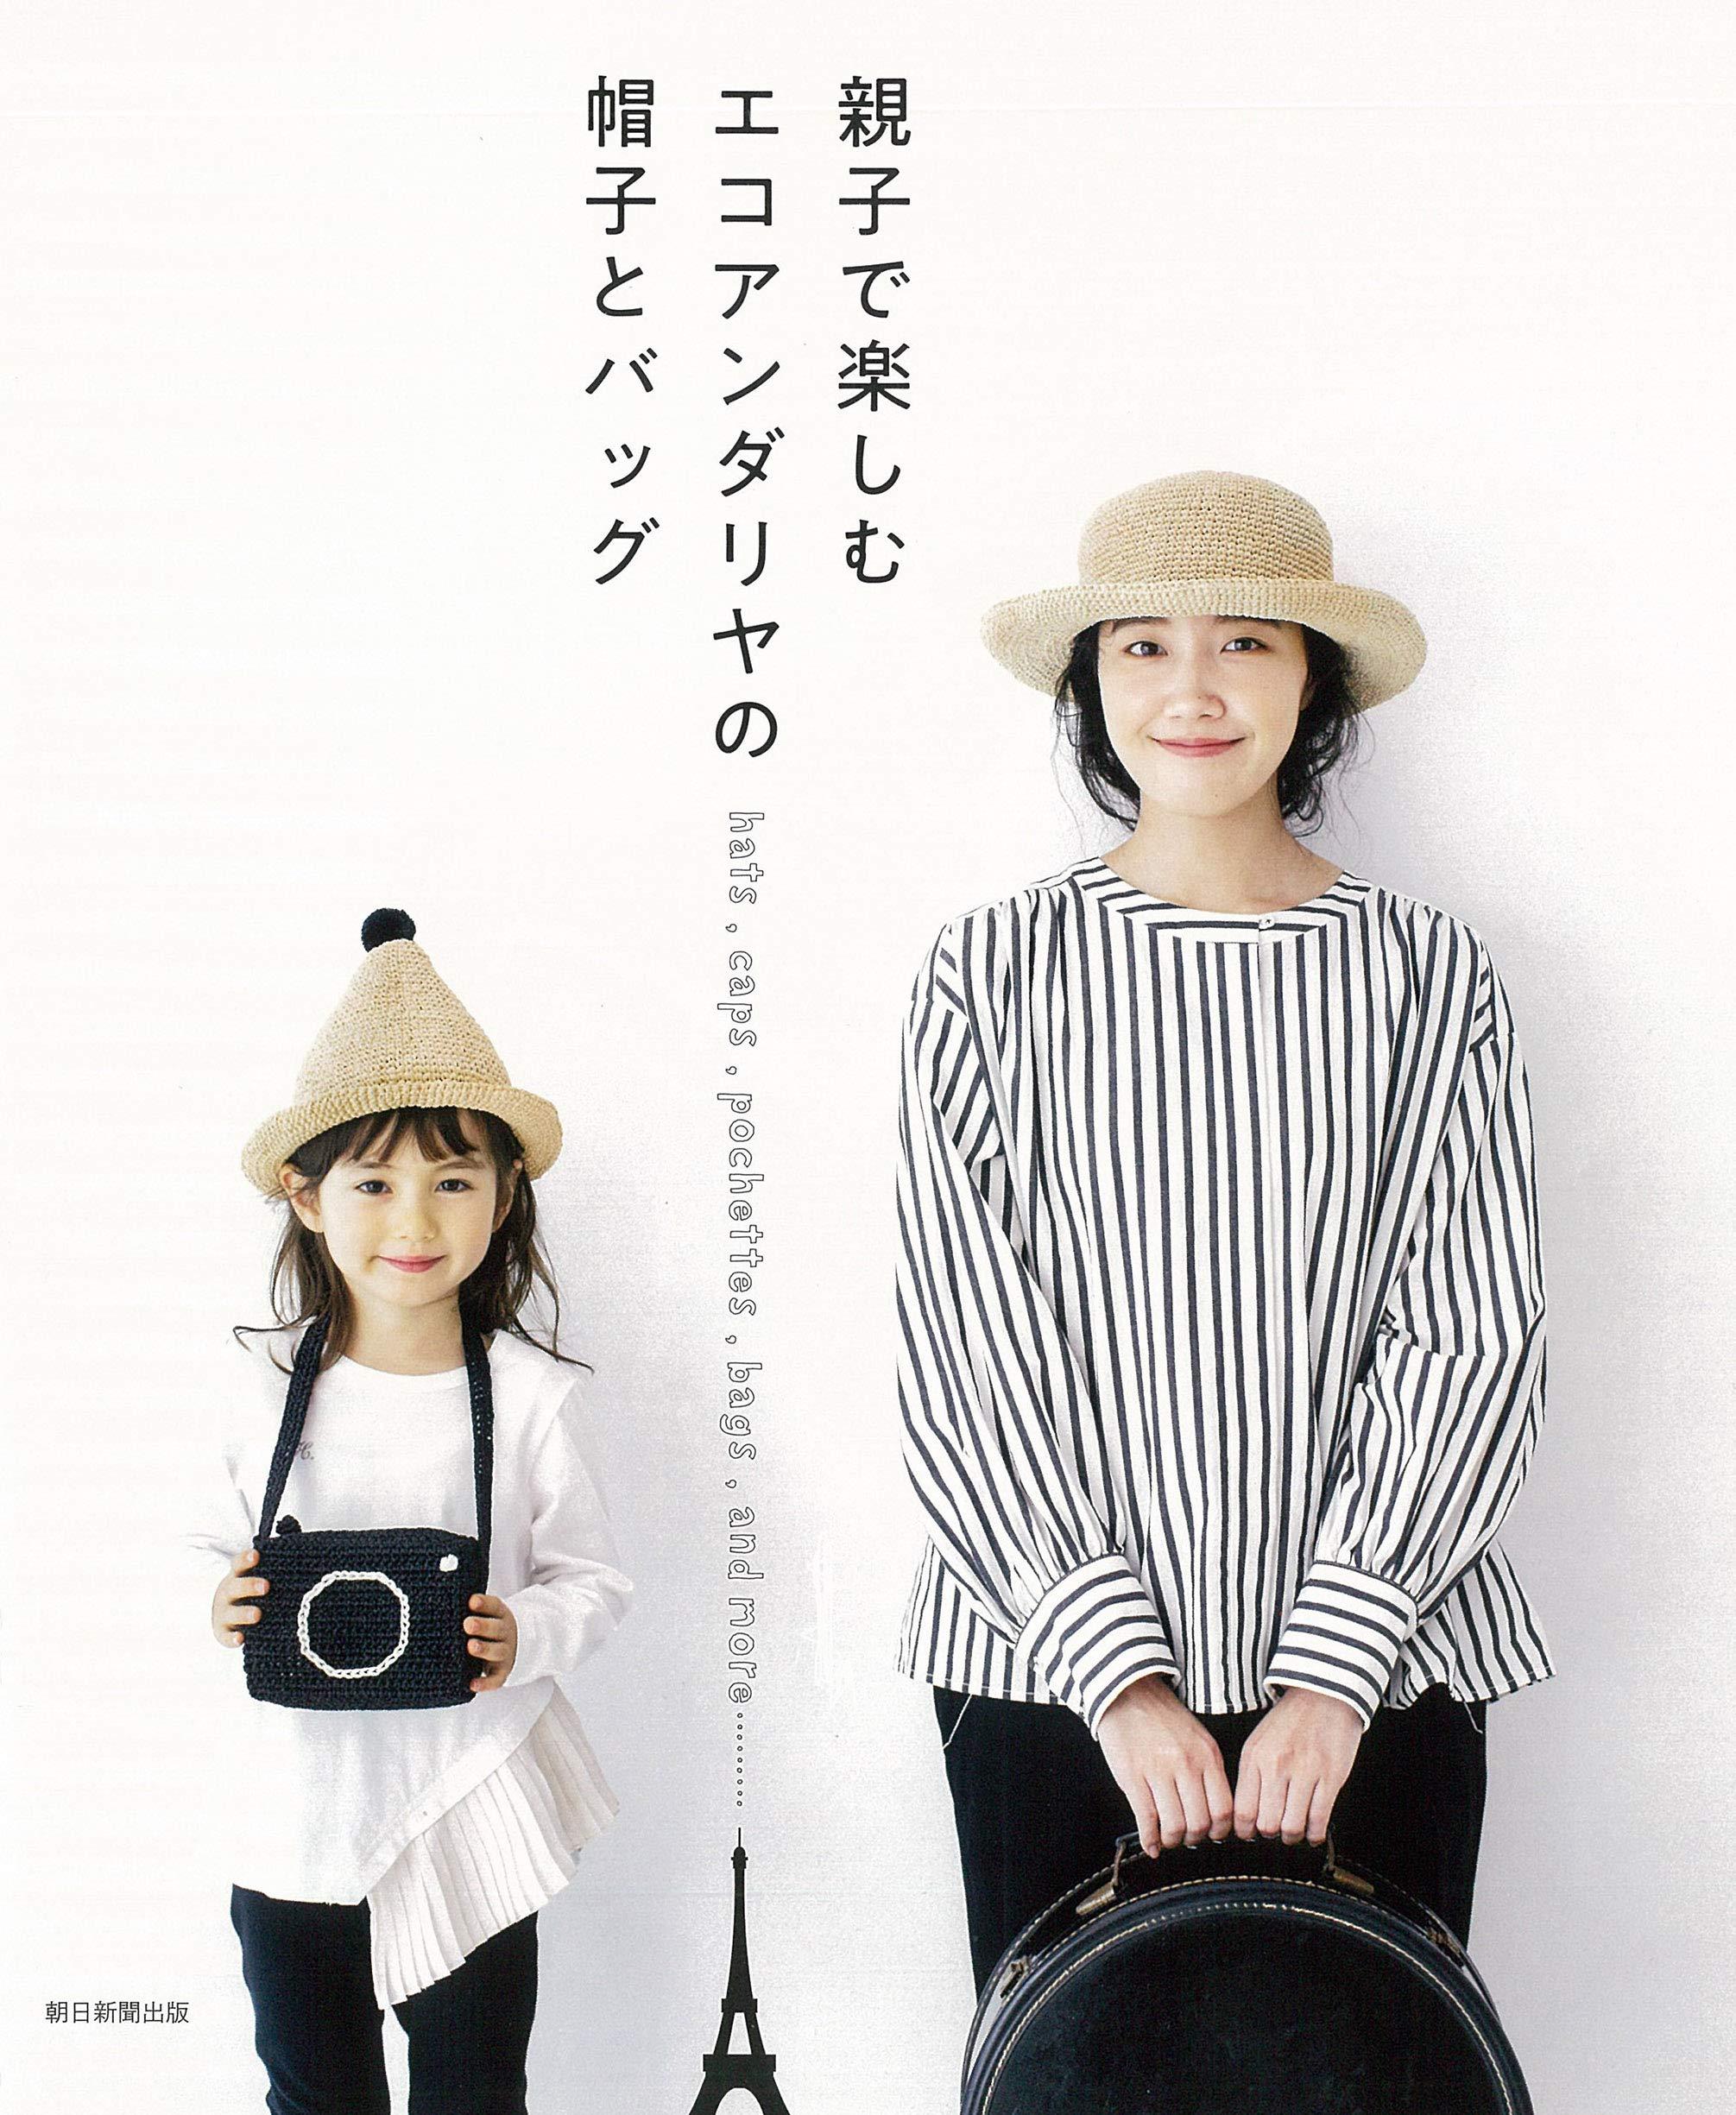 Parents and children enjoy the hat and bag of Ekodaniya